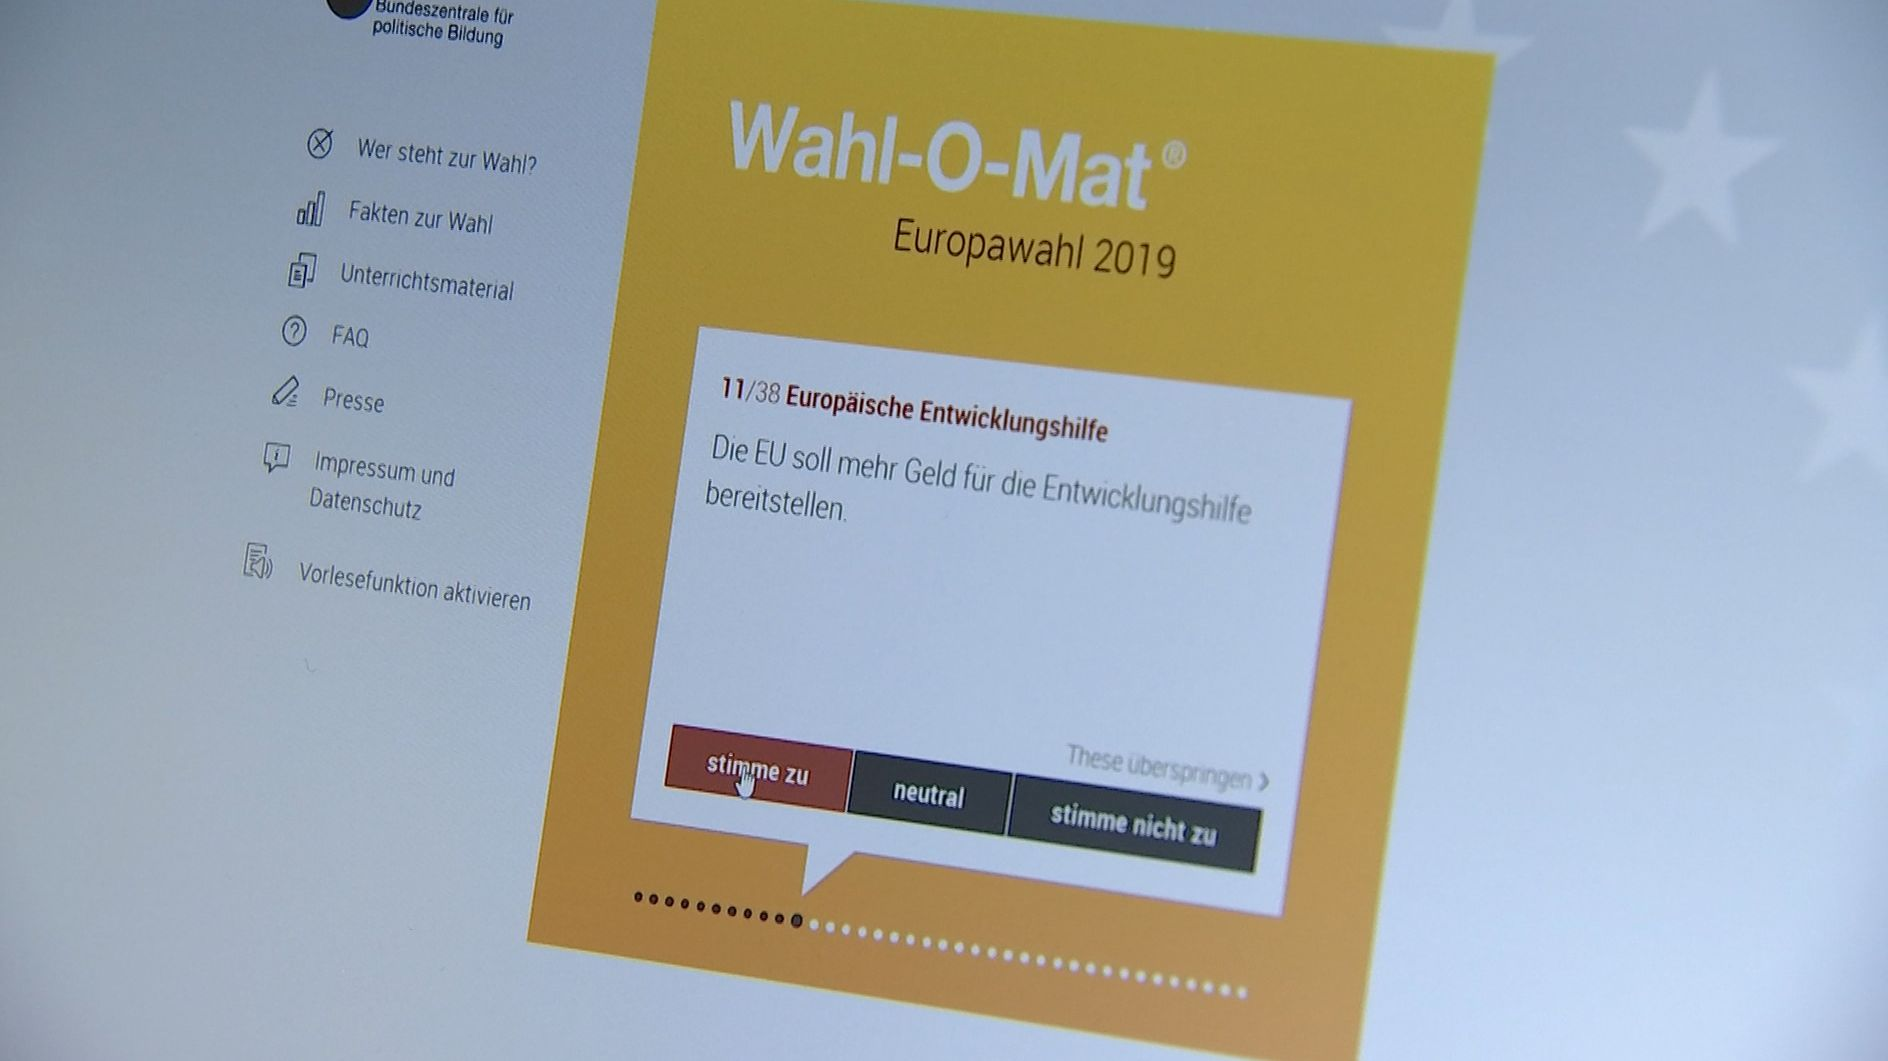 wahlomat europawahlen